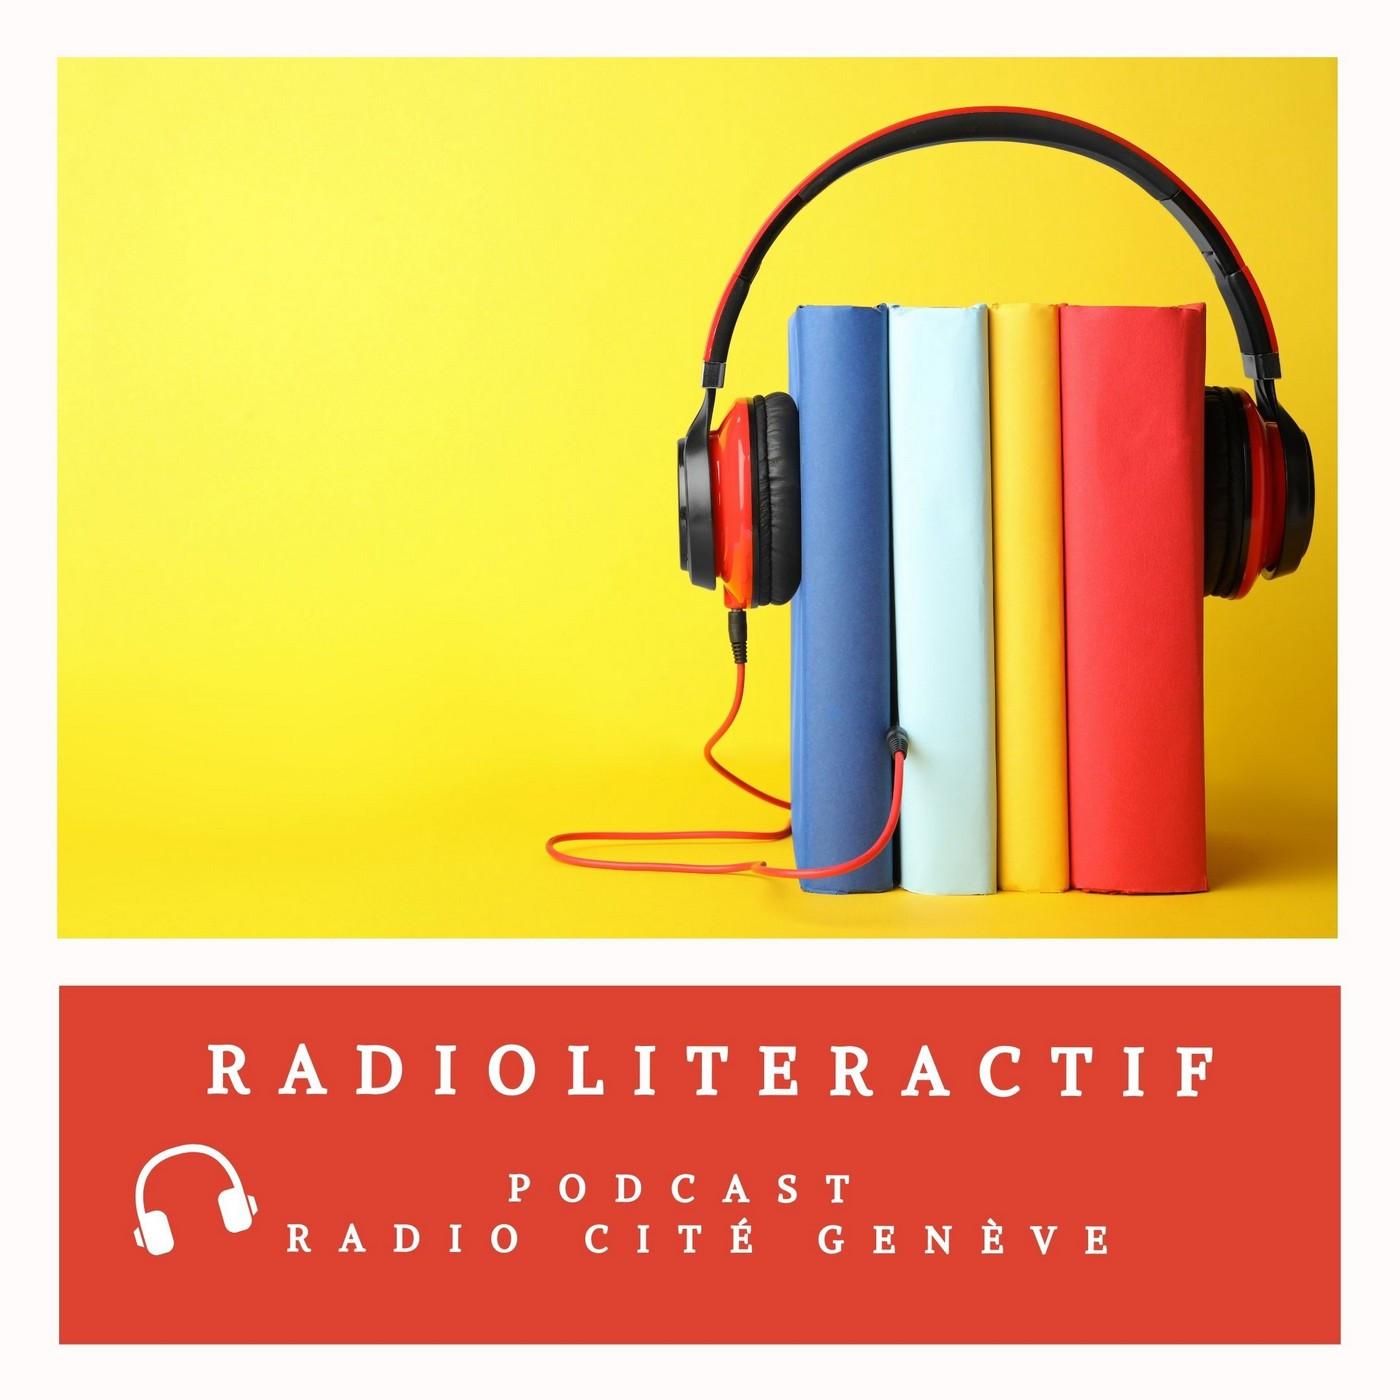 Radioliteractif du 15/02/2021 - Marina Cavazza